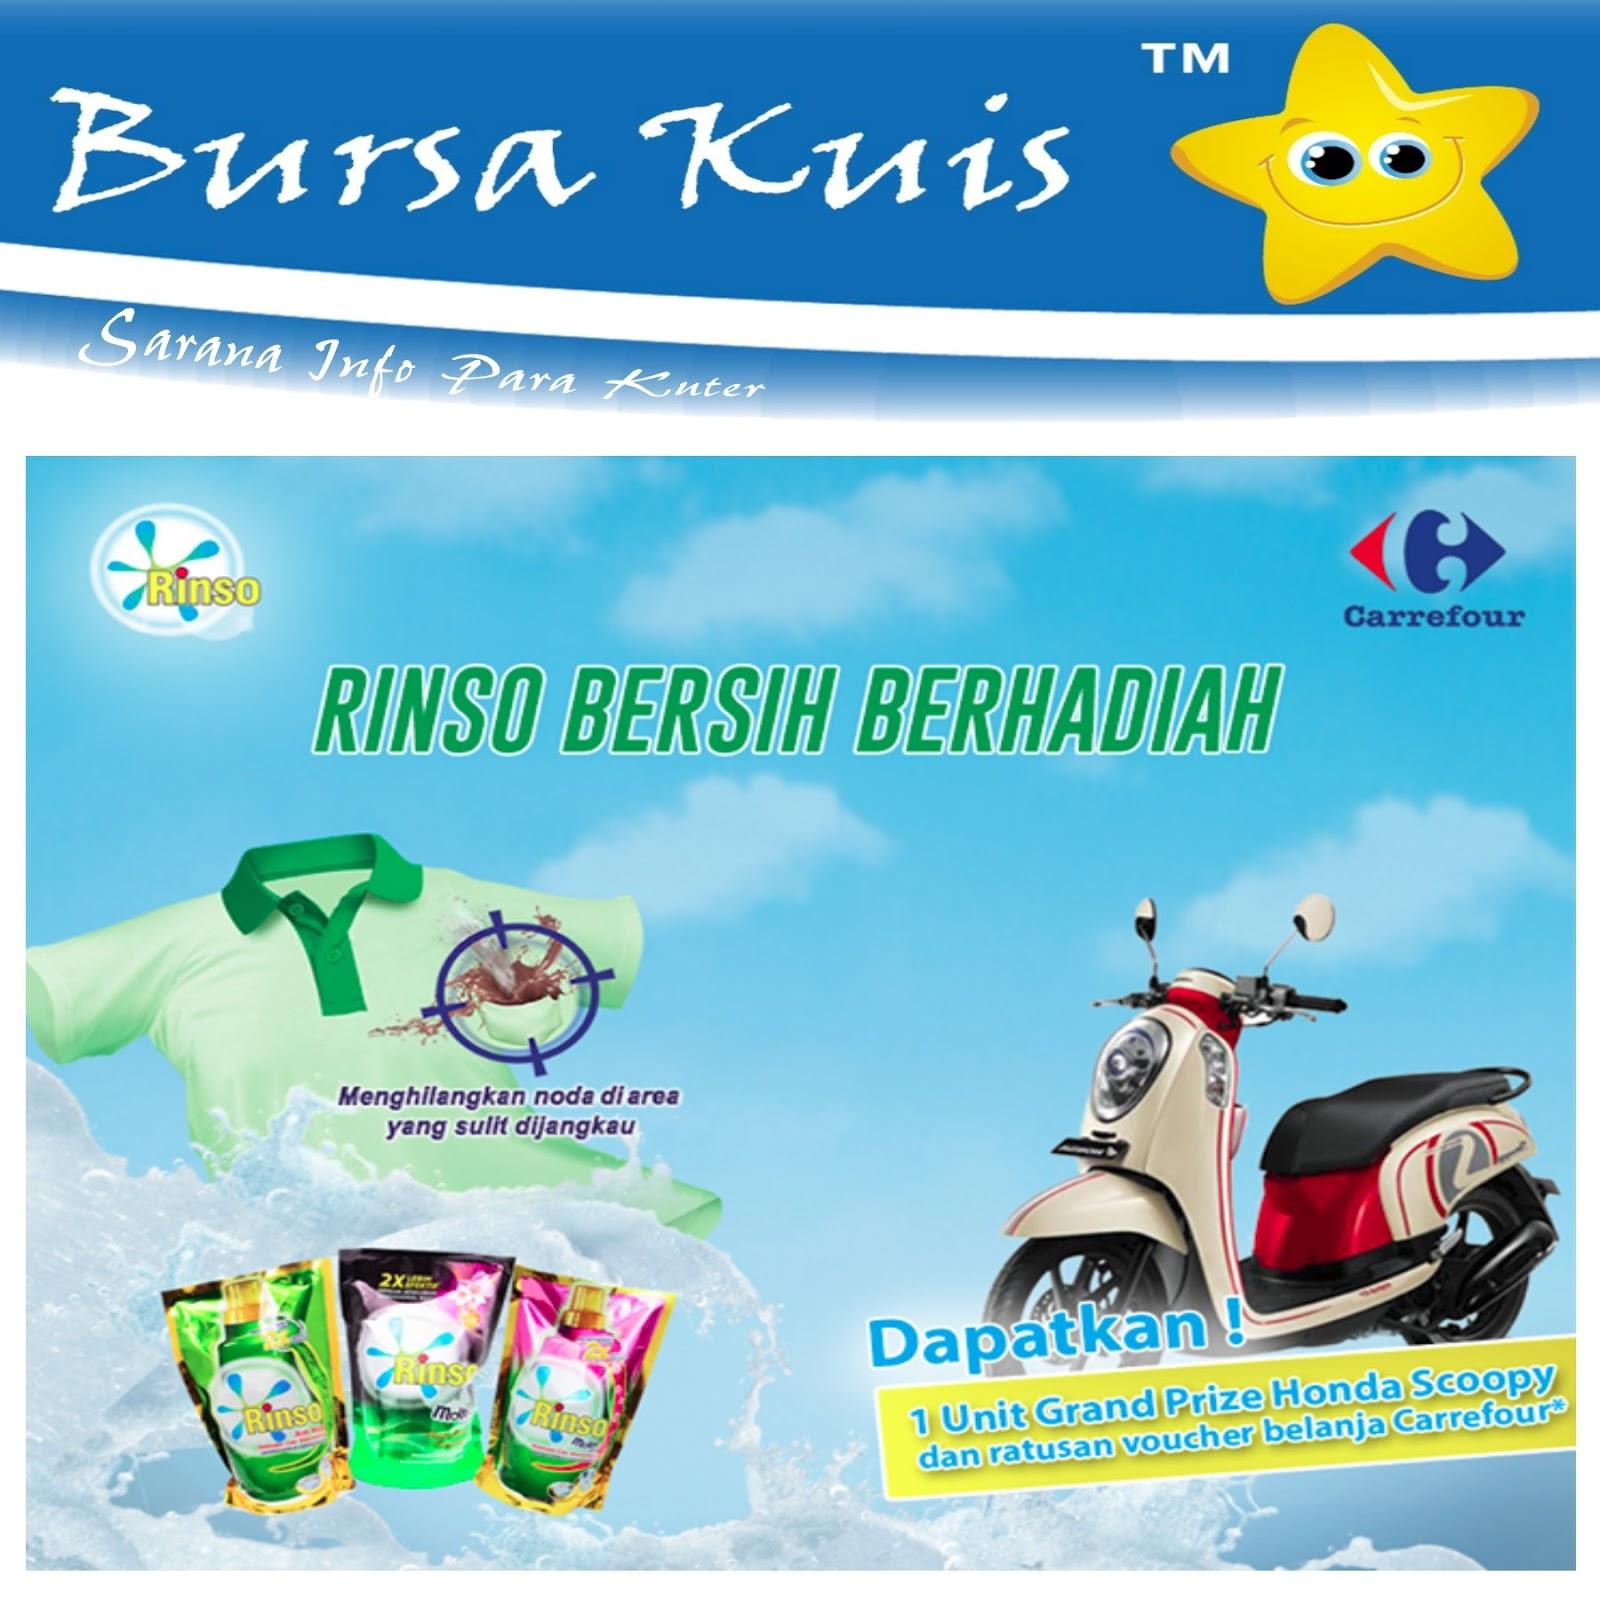 Undian Rinso Bersih Bersama Carrefour Berhadiah Motor Scoopy